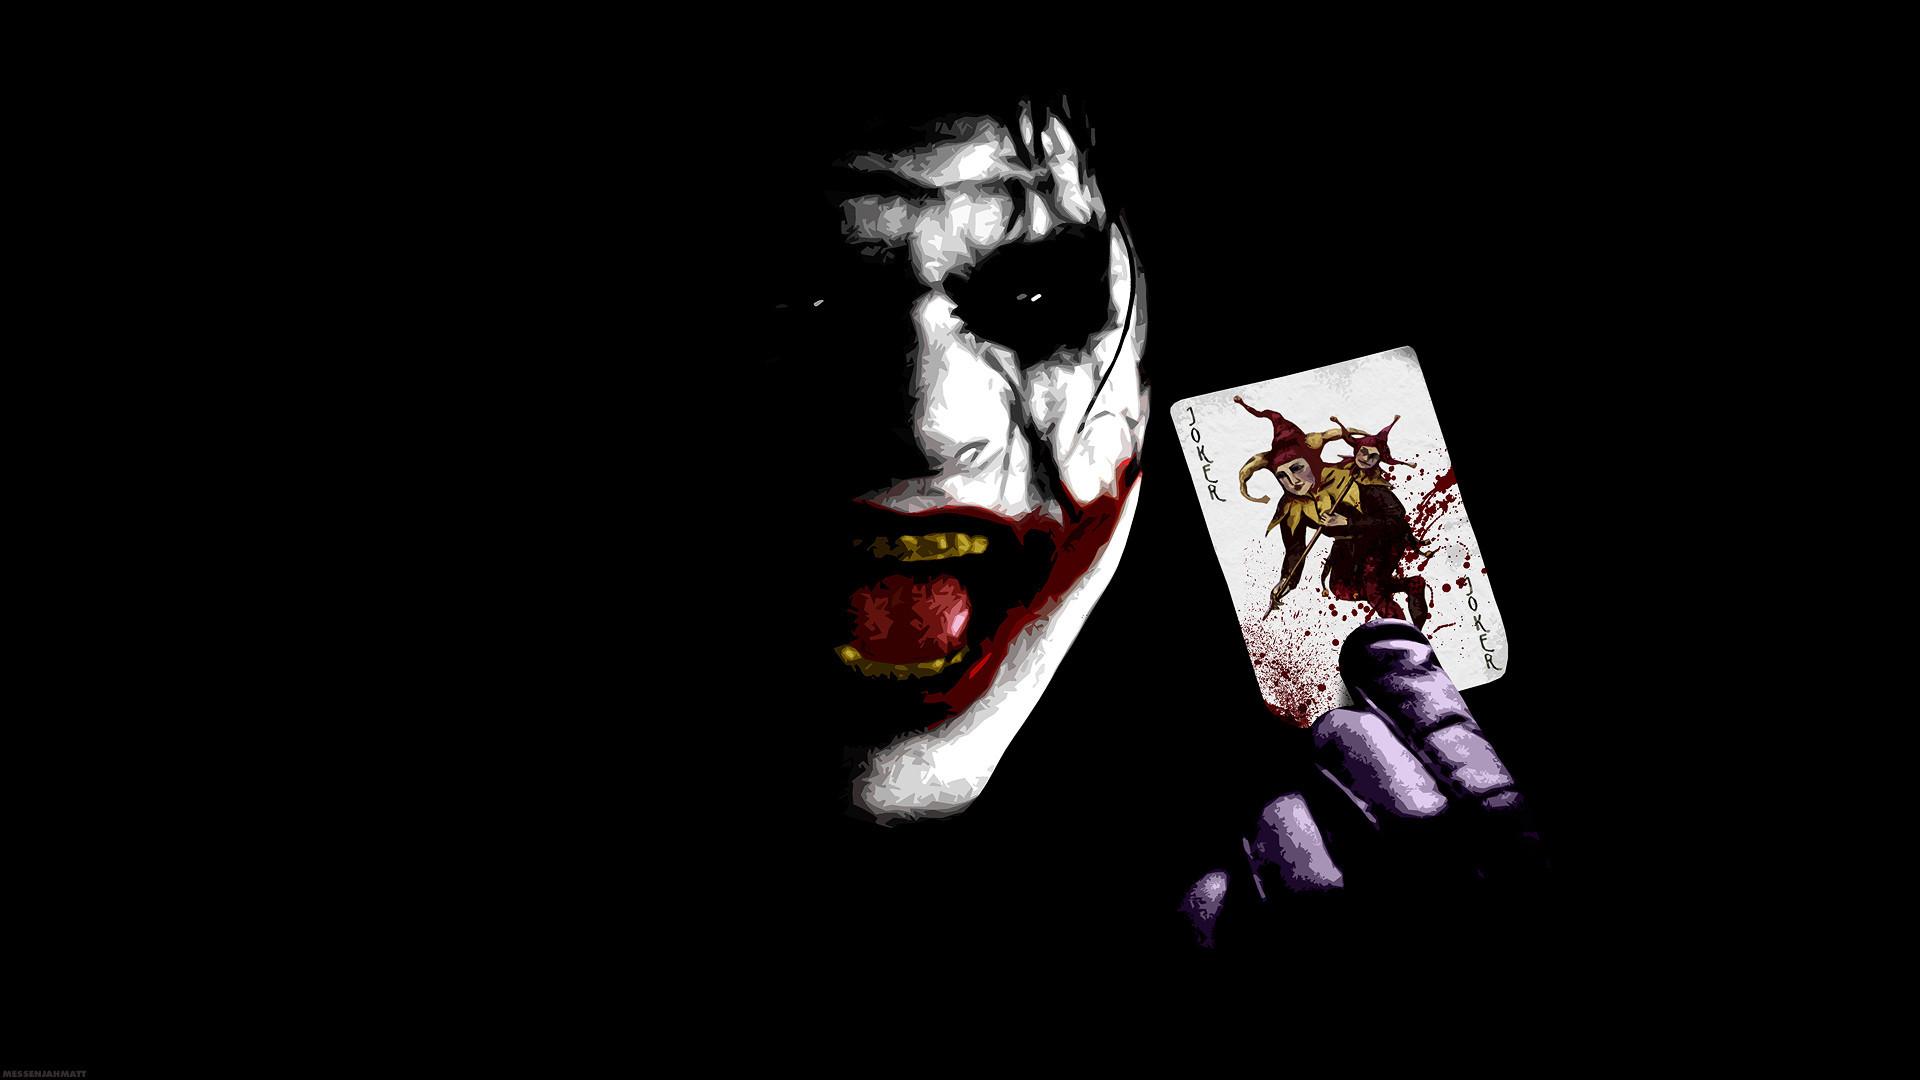 Dc-comics Fan-art Heath Ledger The Joker